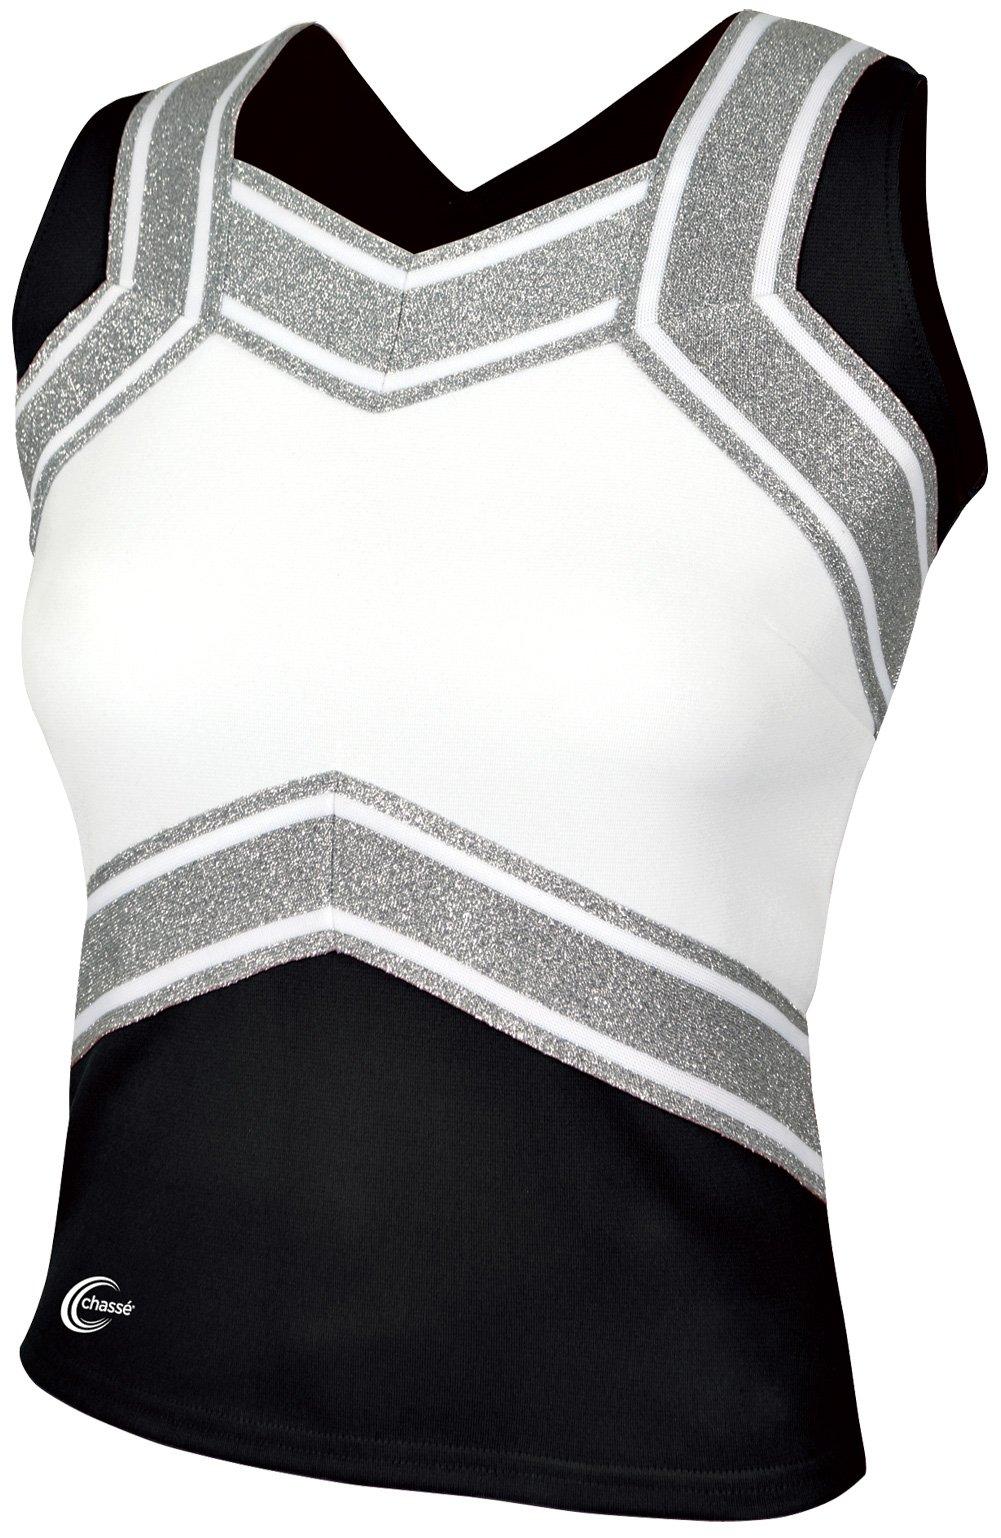 Chassé Girls' Blaze Shell Top Black/White/Metallic Silver Youth X-Small